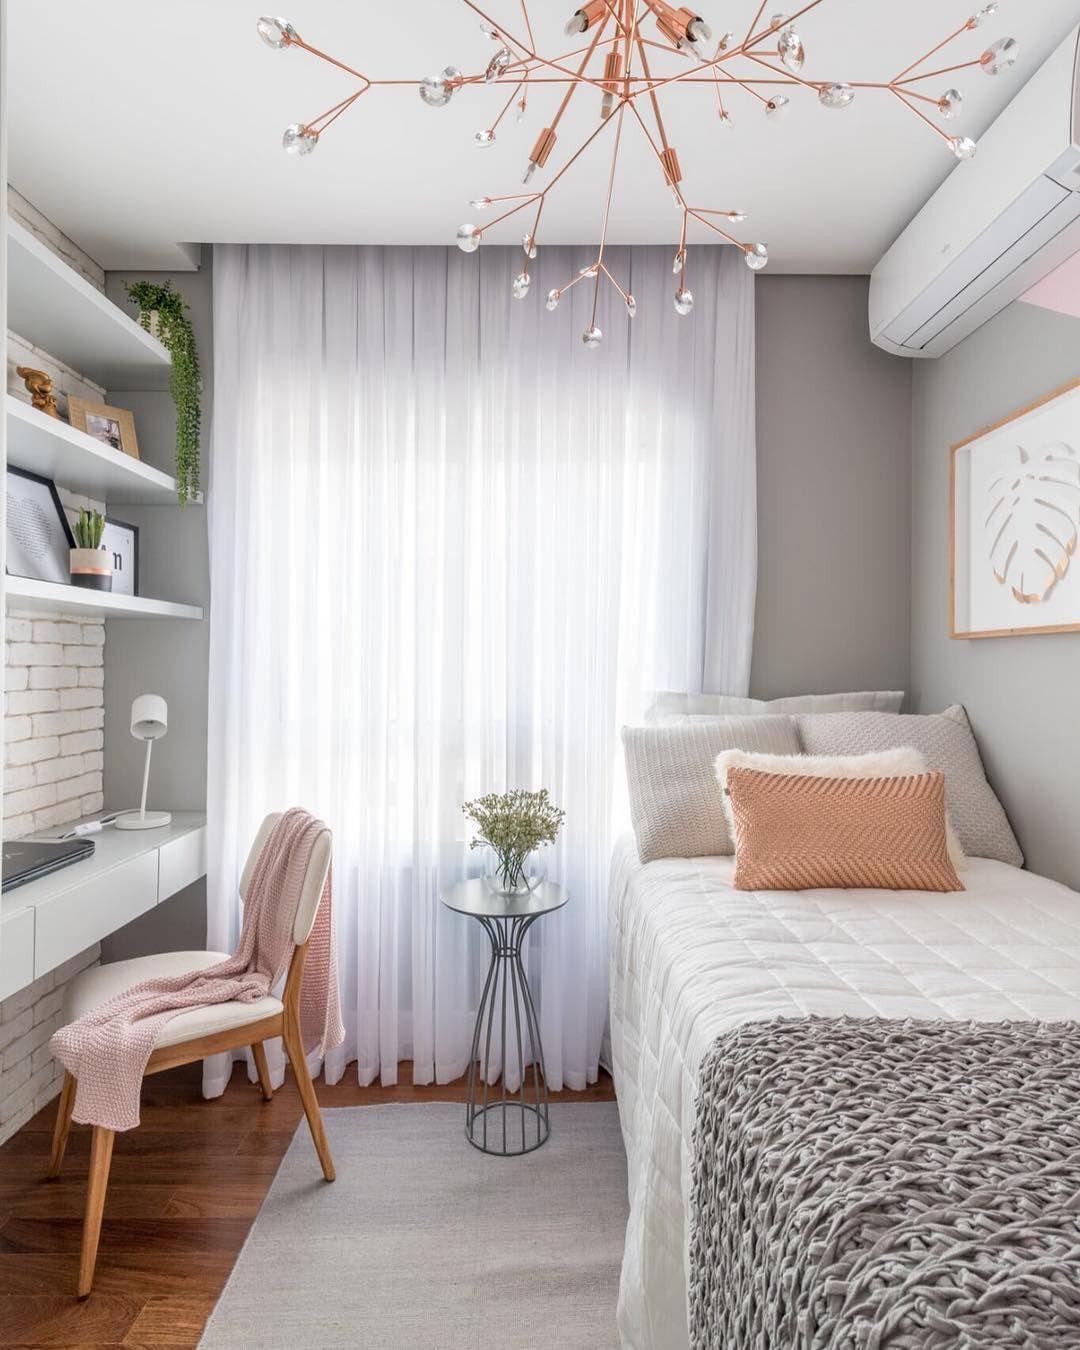 Brilliant Small Bedroom Ideas For Teenage Girl Smallbedrooms Bedroom Bedroomdecor Bedroomideas Bedro Woman Bedroom Small Bedroom Decor Small Room Bedroom